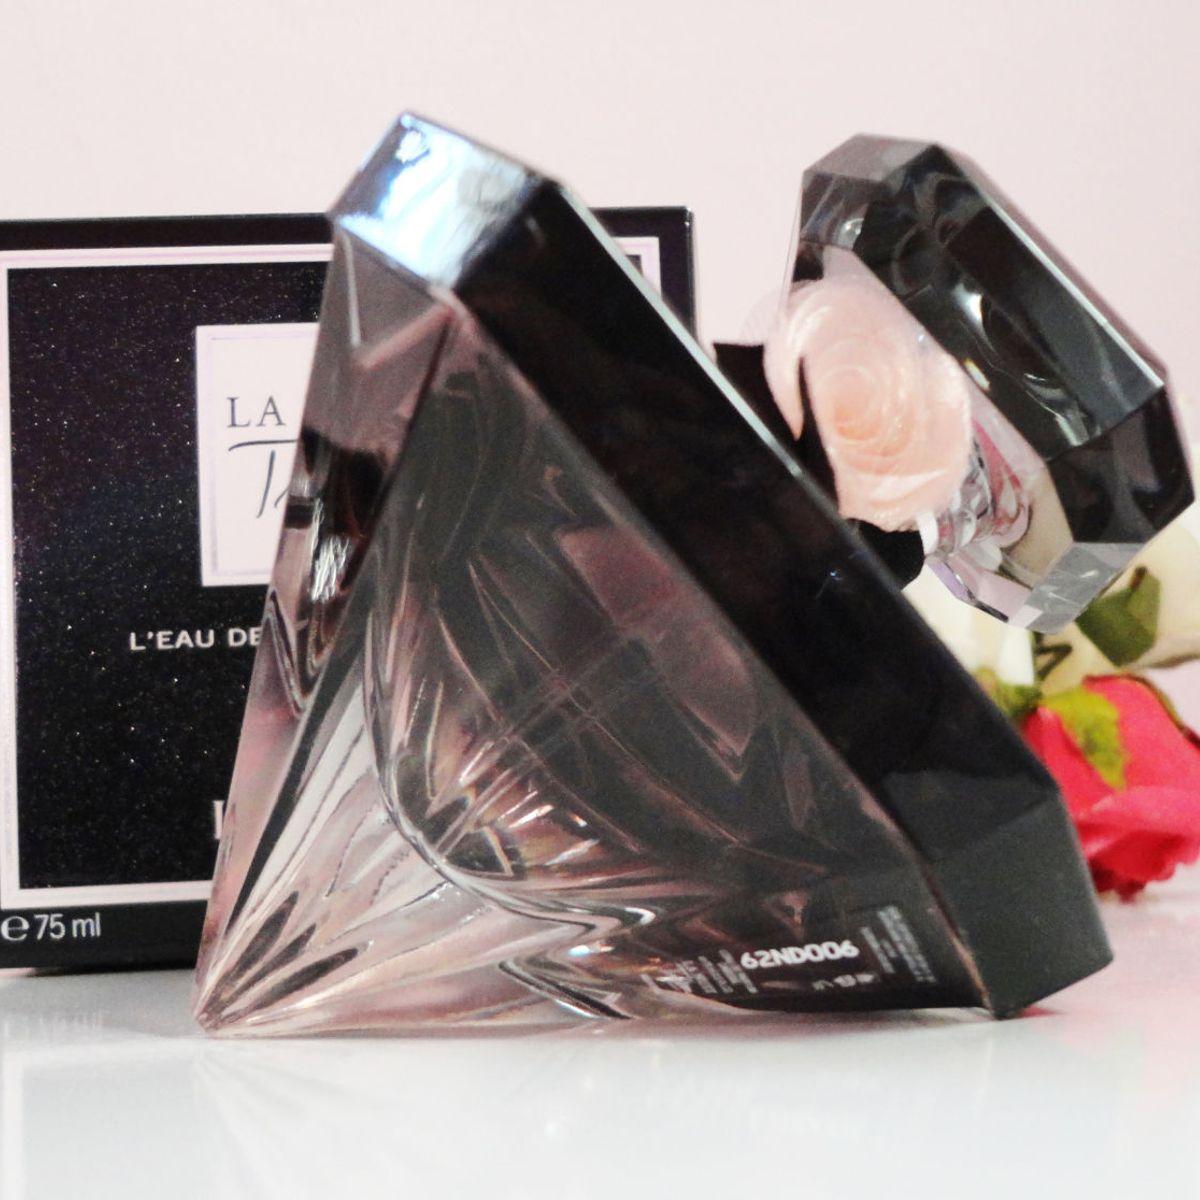 b1536f8f4 Perfume La Nuit Trésor Caresse Edp 75ml - Tester Original